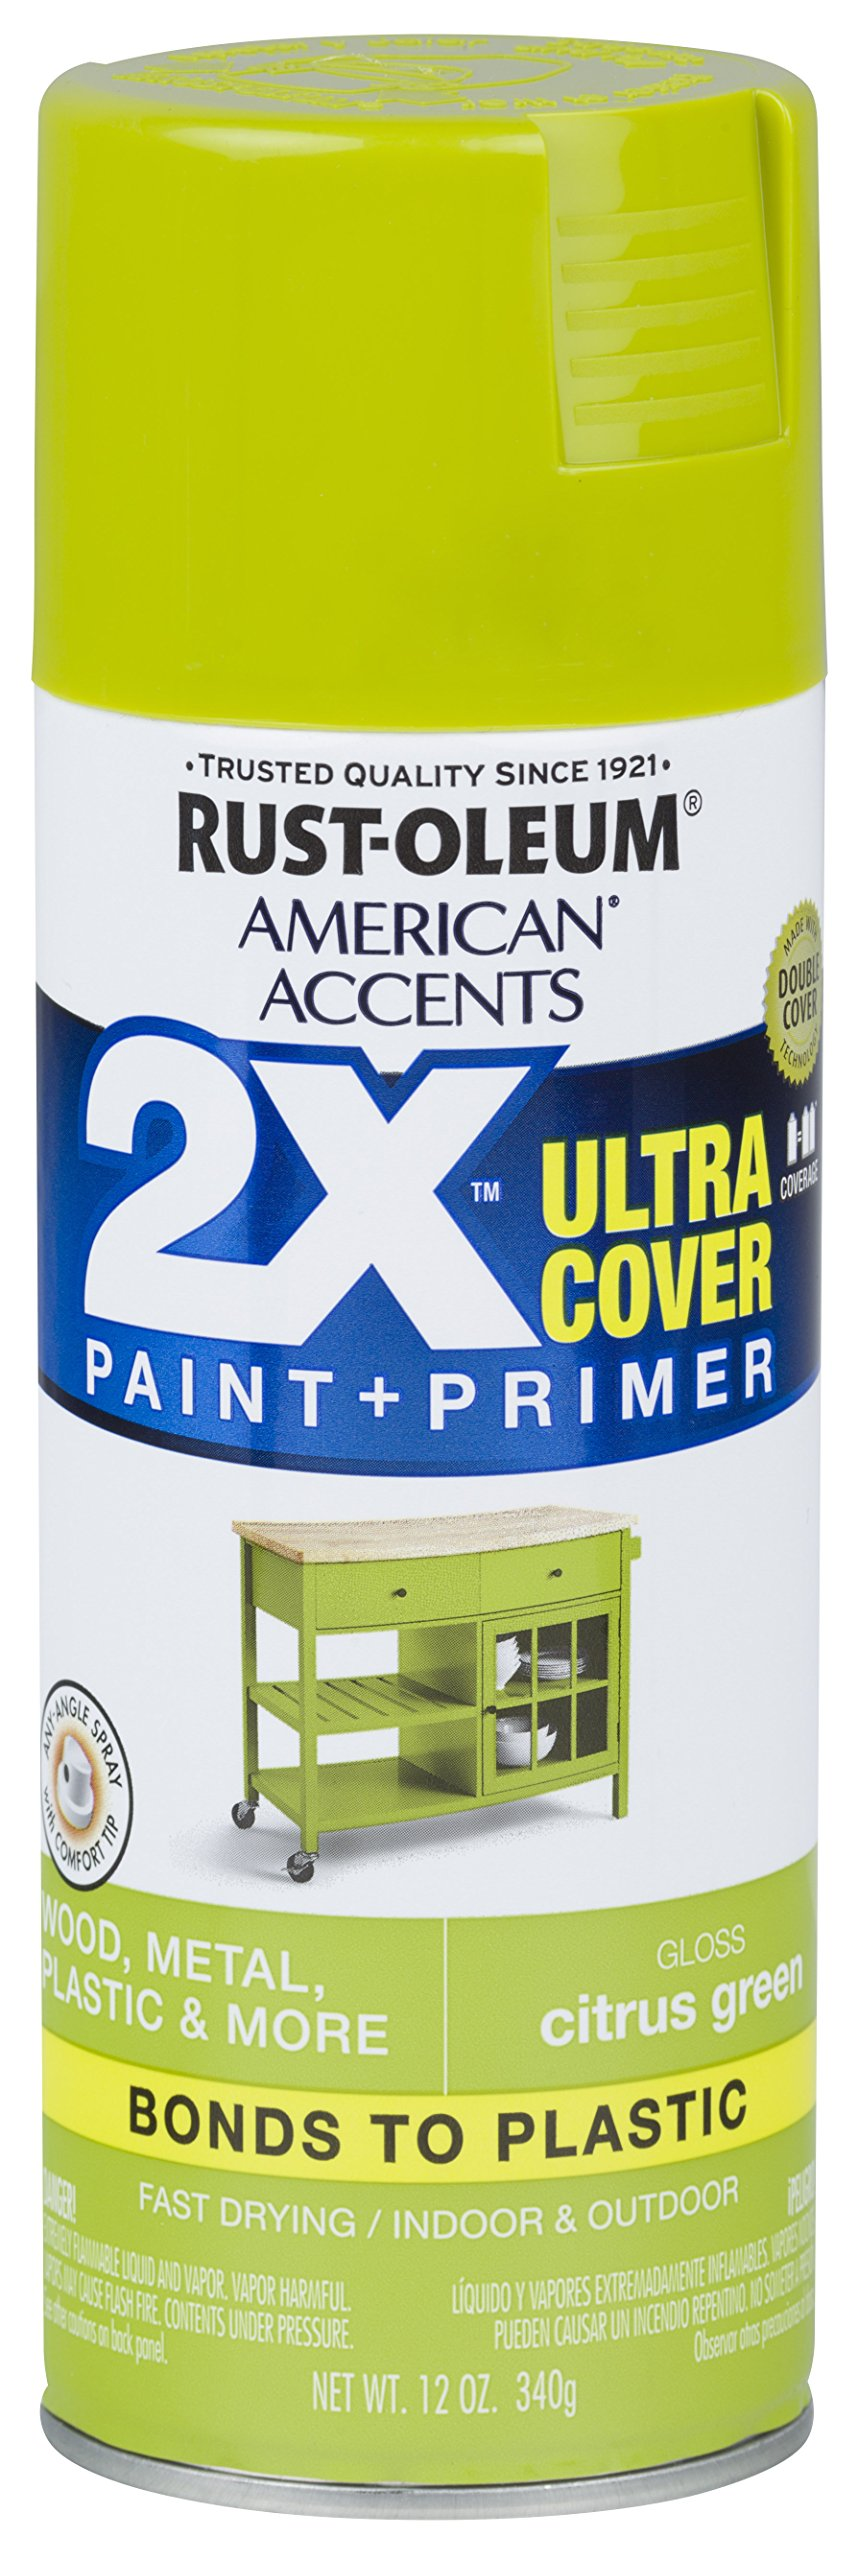 Rust-Oleum 327887 American Accents Spray Paint, 12 oz, Gloss Citrus Green